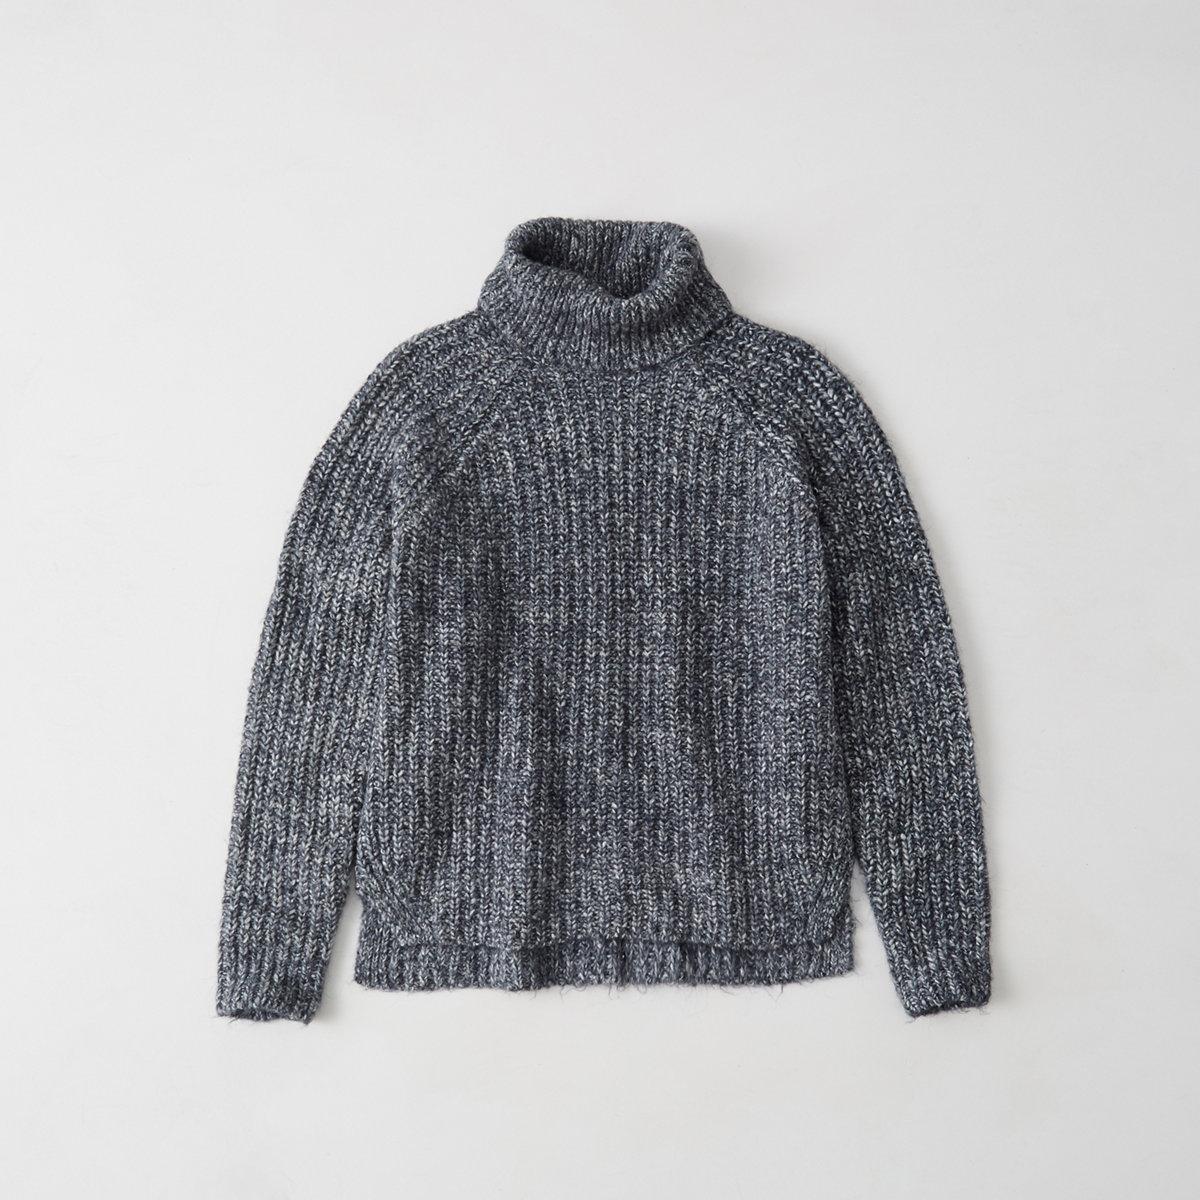 Shaker Turtleneck Sweater